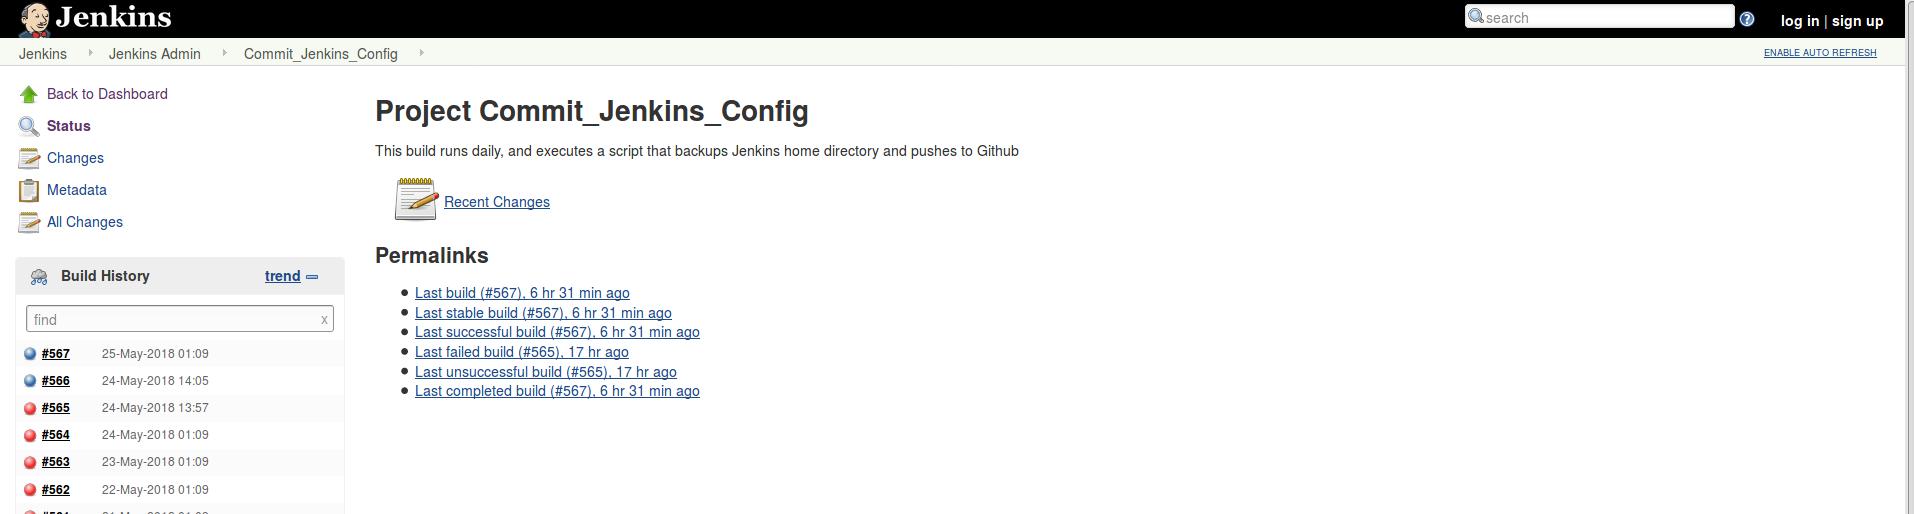 Jenkins Config Build